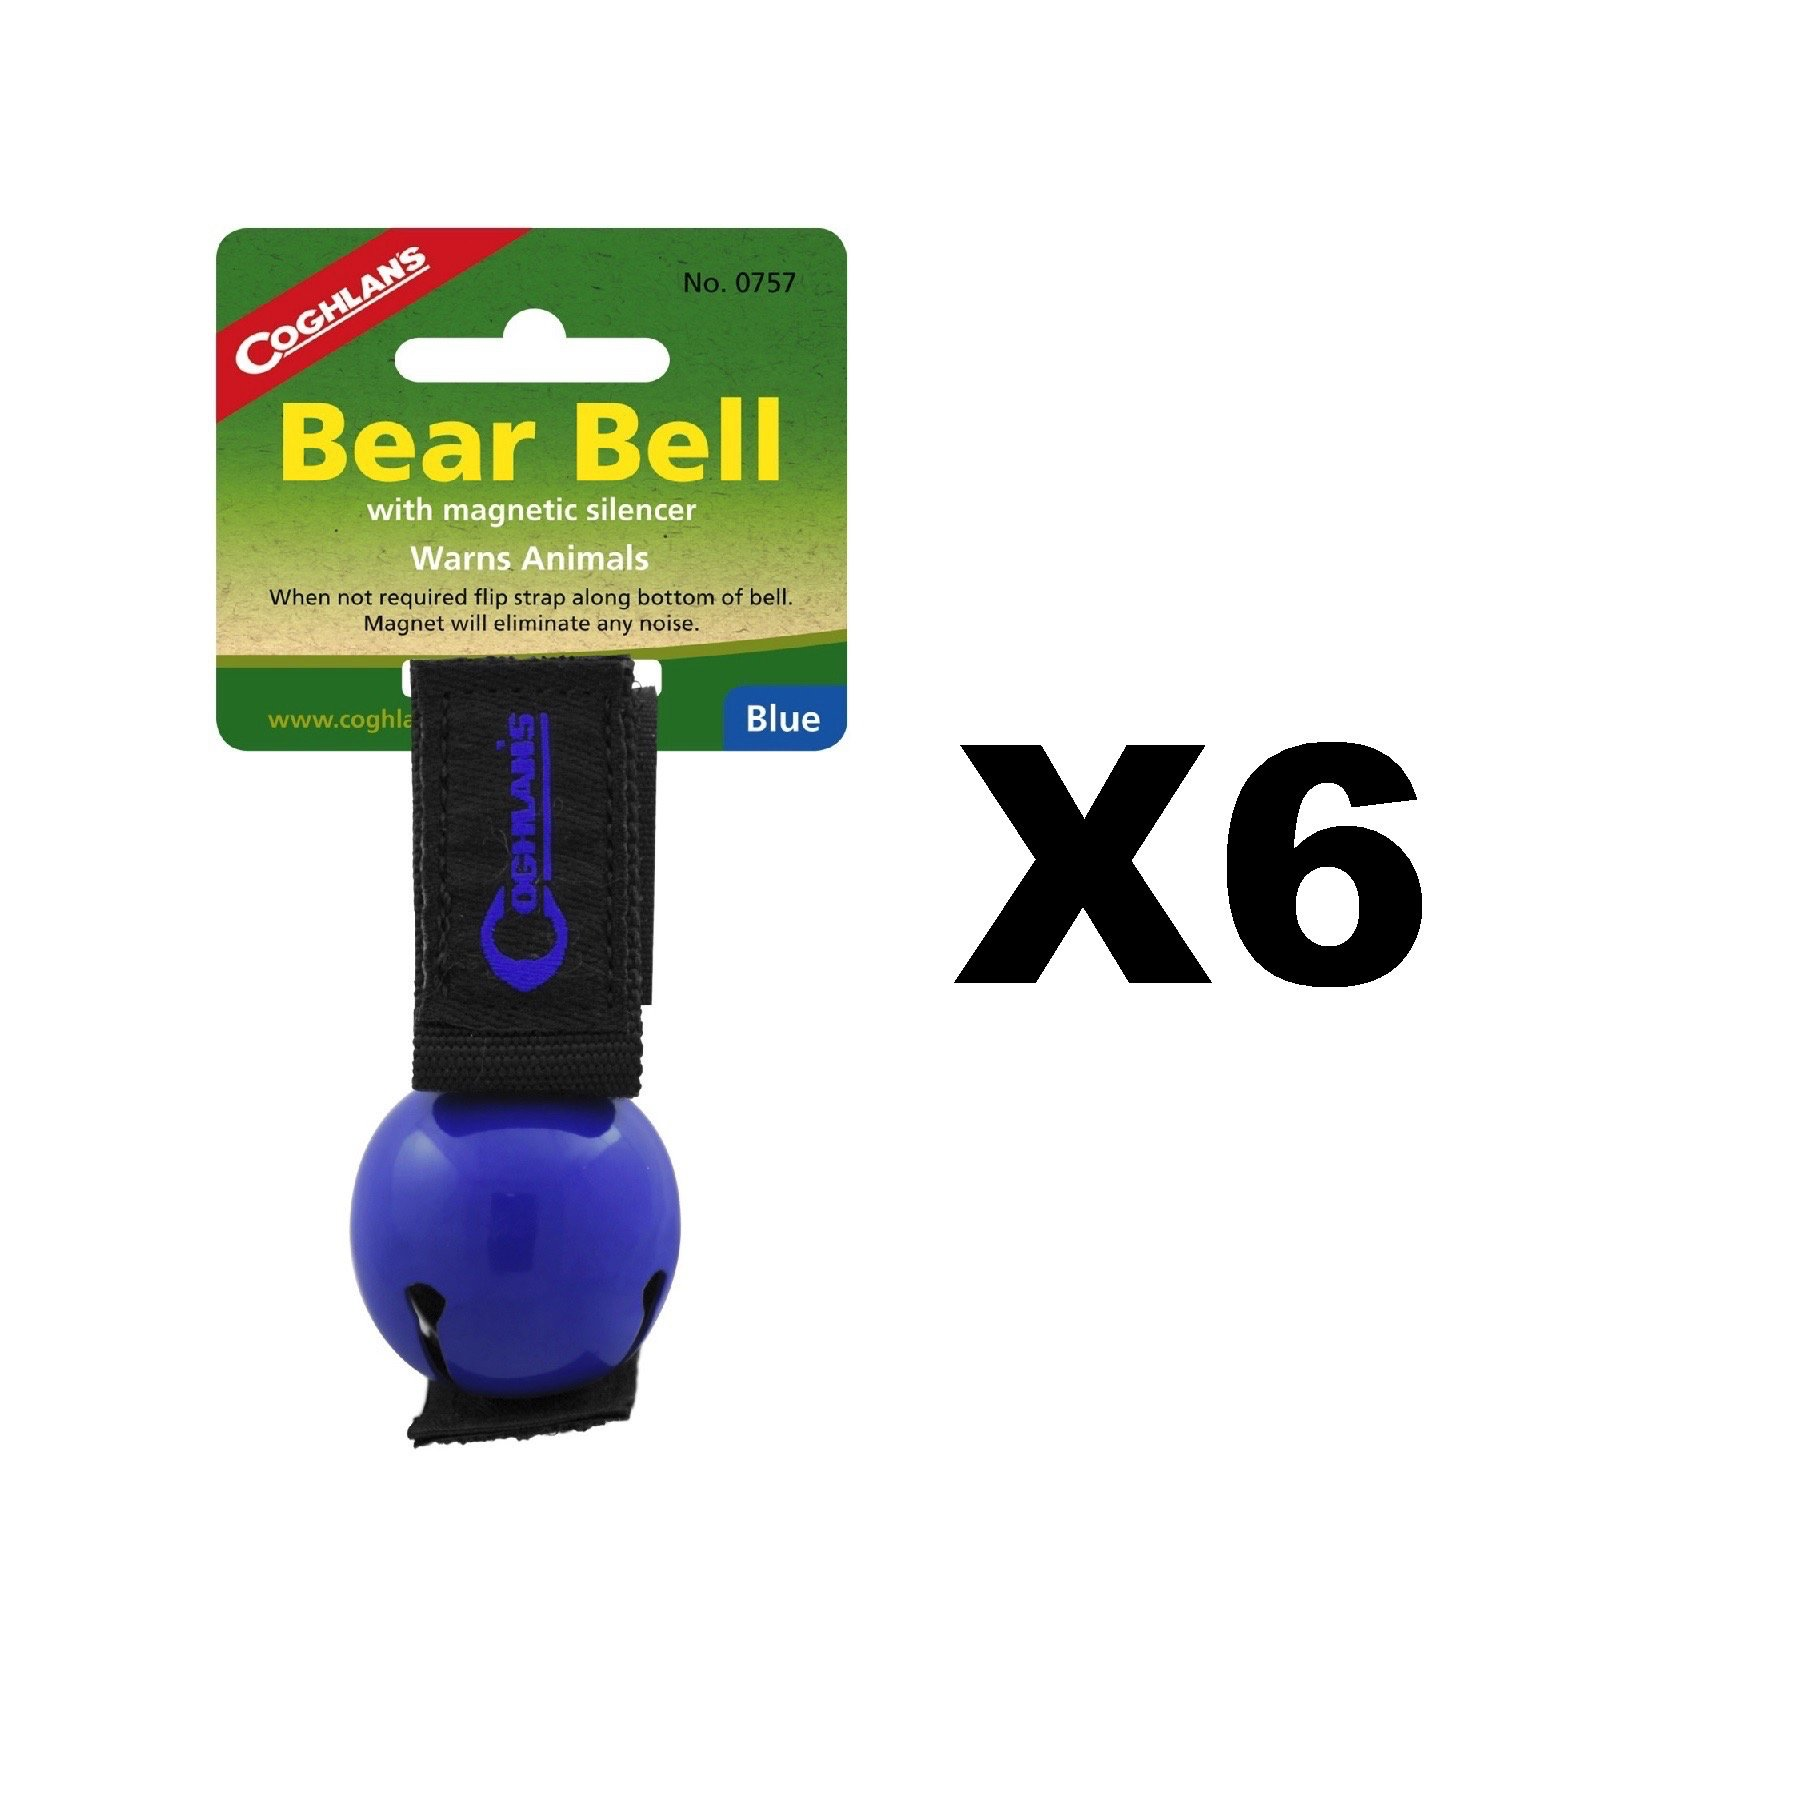 Coghlan's Bear Bell Blue w/Magnetic Silencer & Loop Strap Warns Animals (6-Pack)